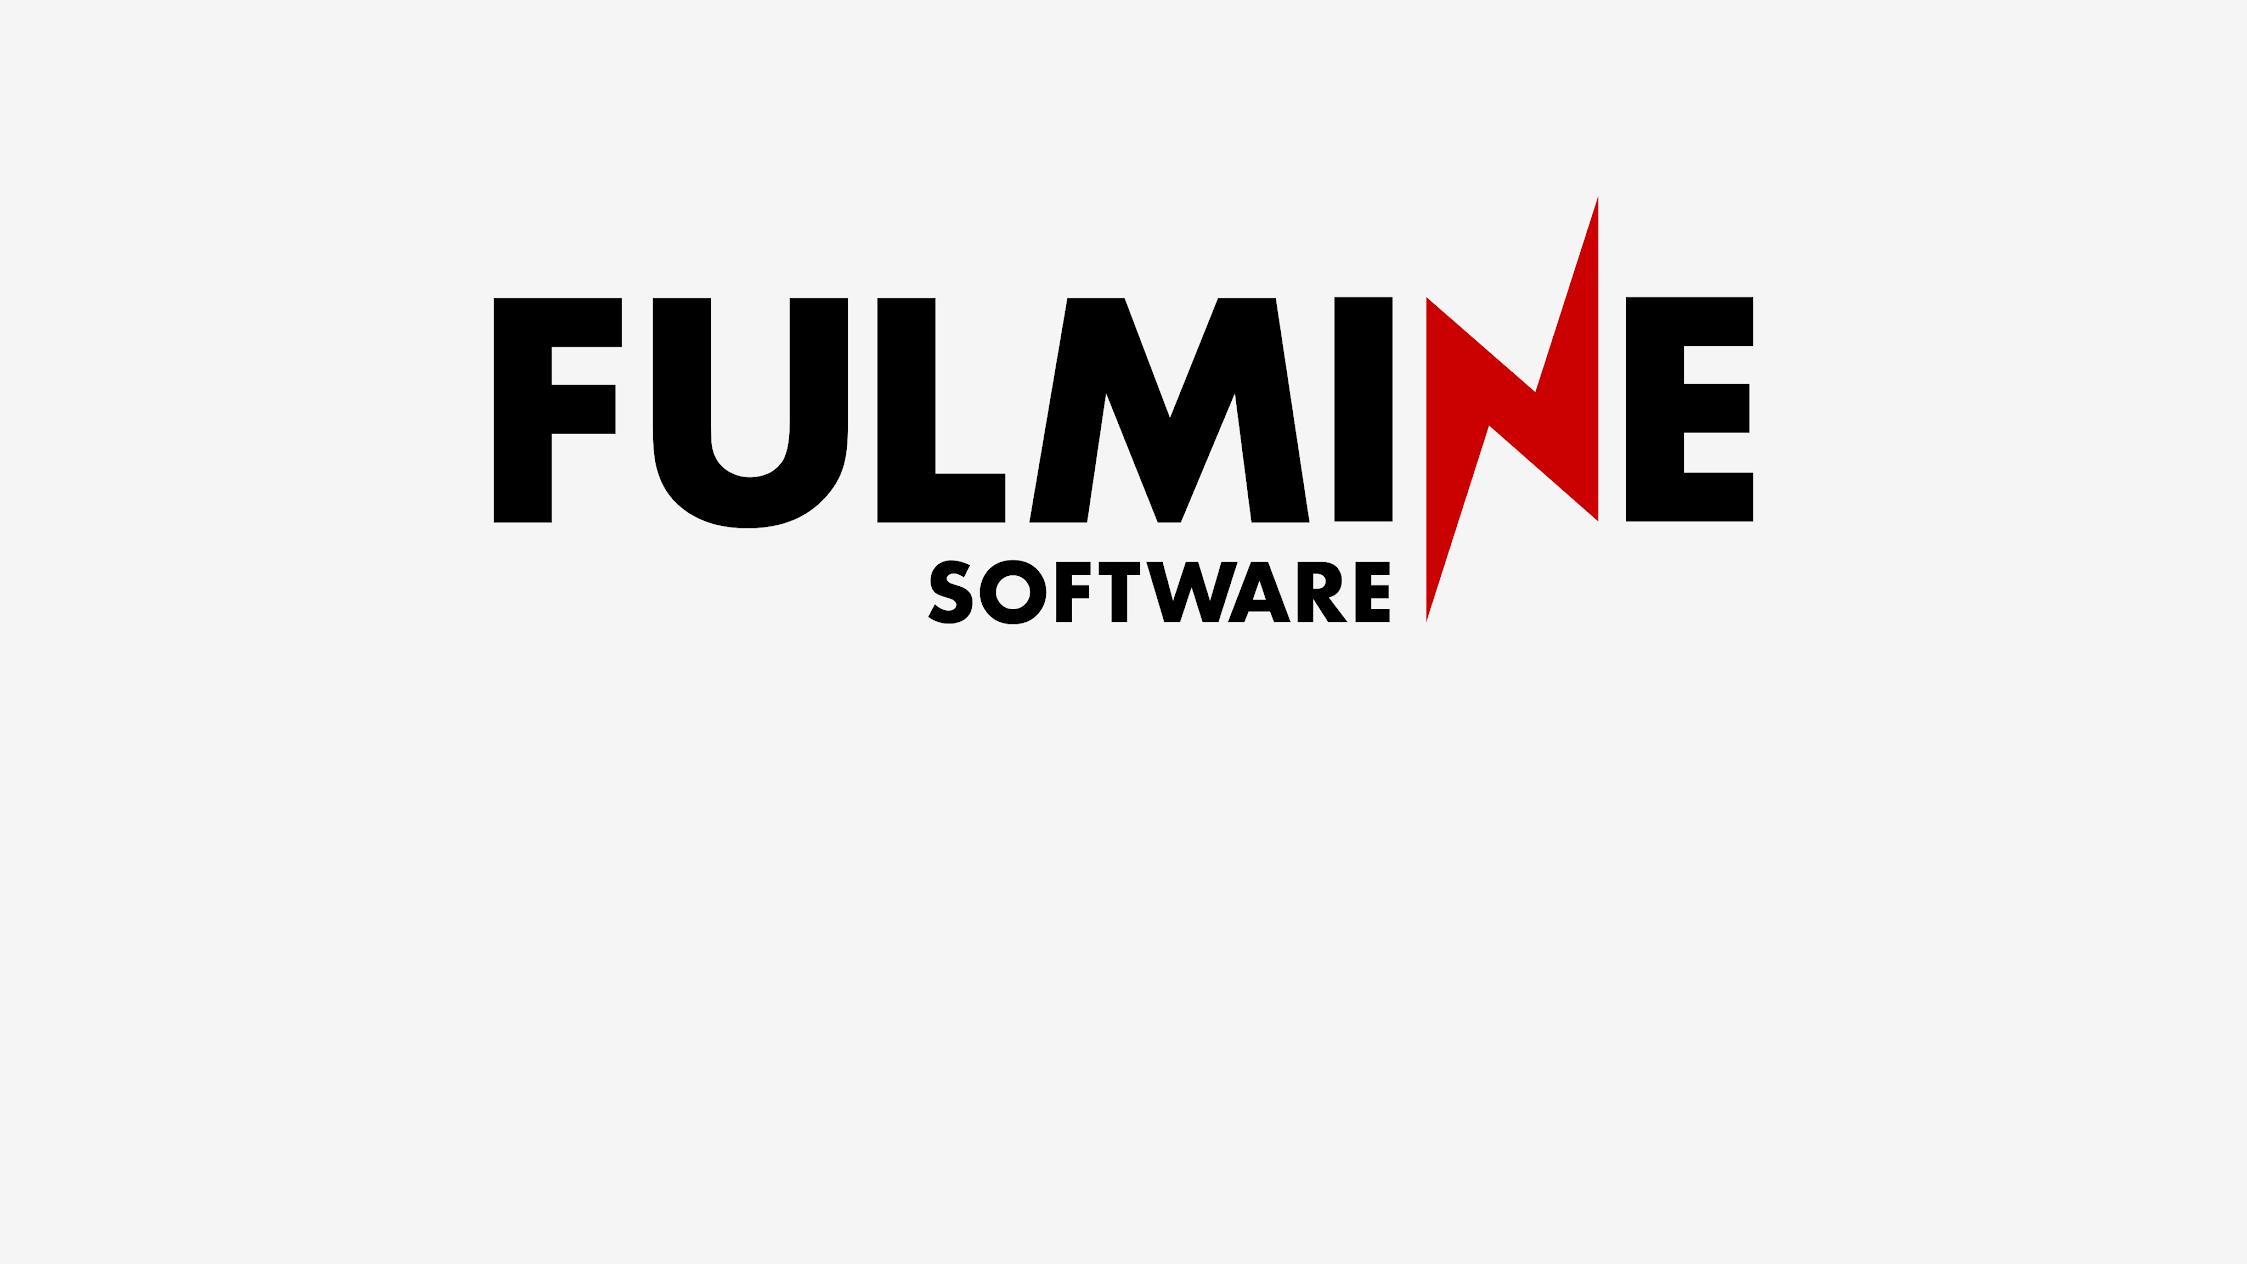 Fulmine Software